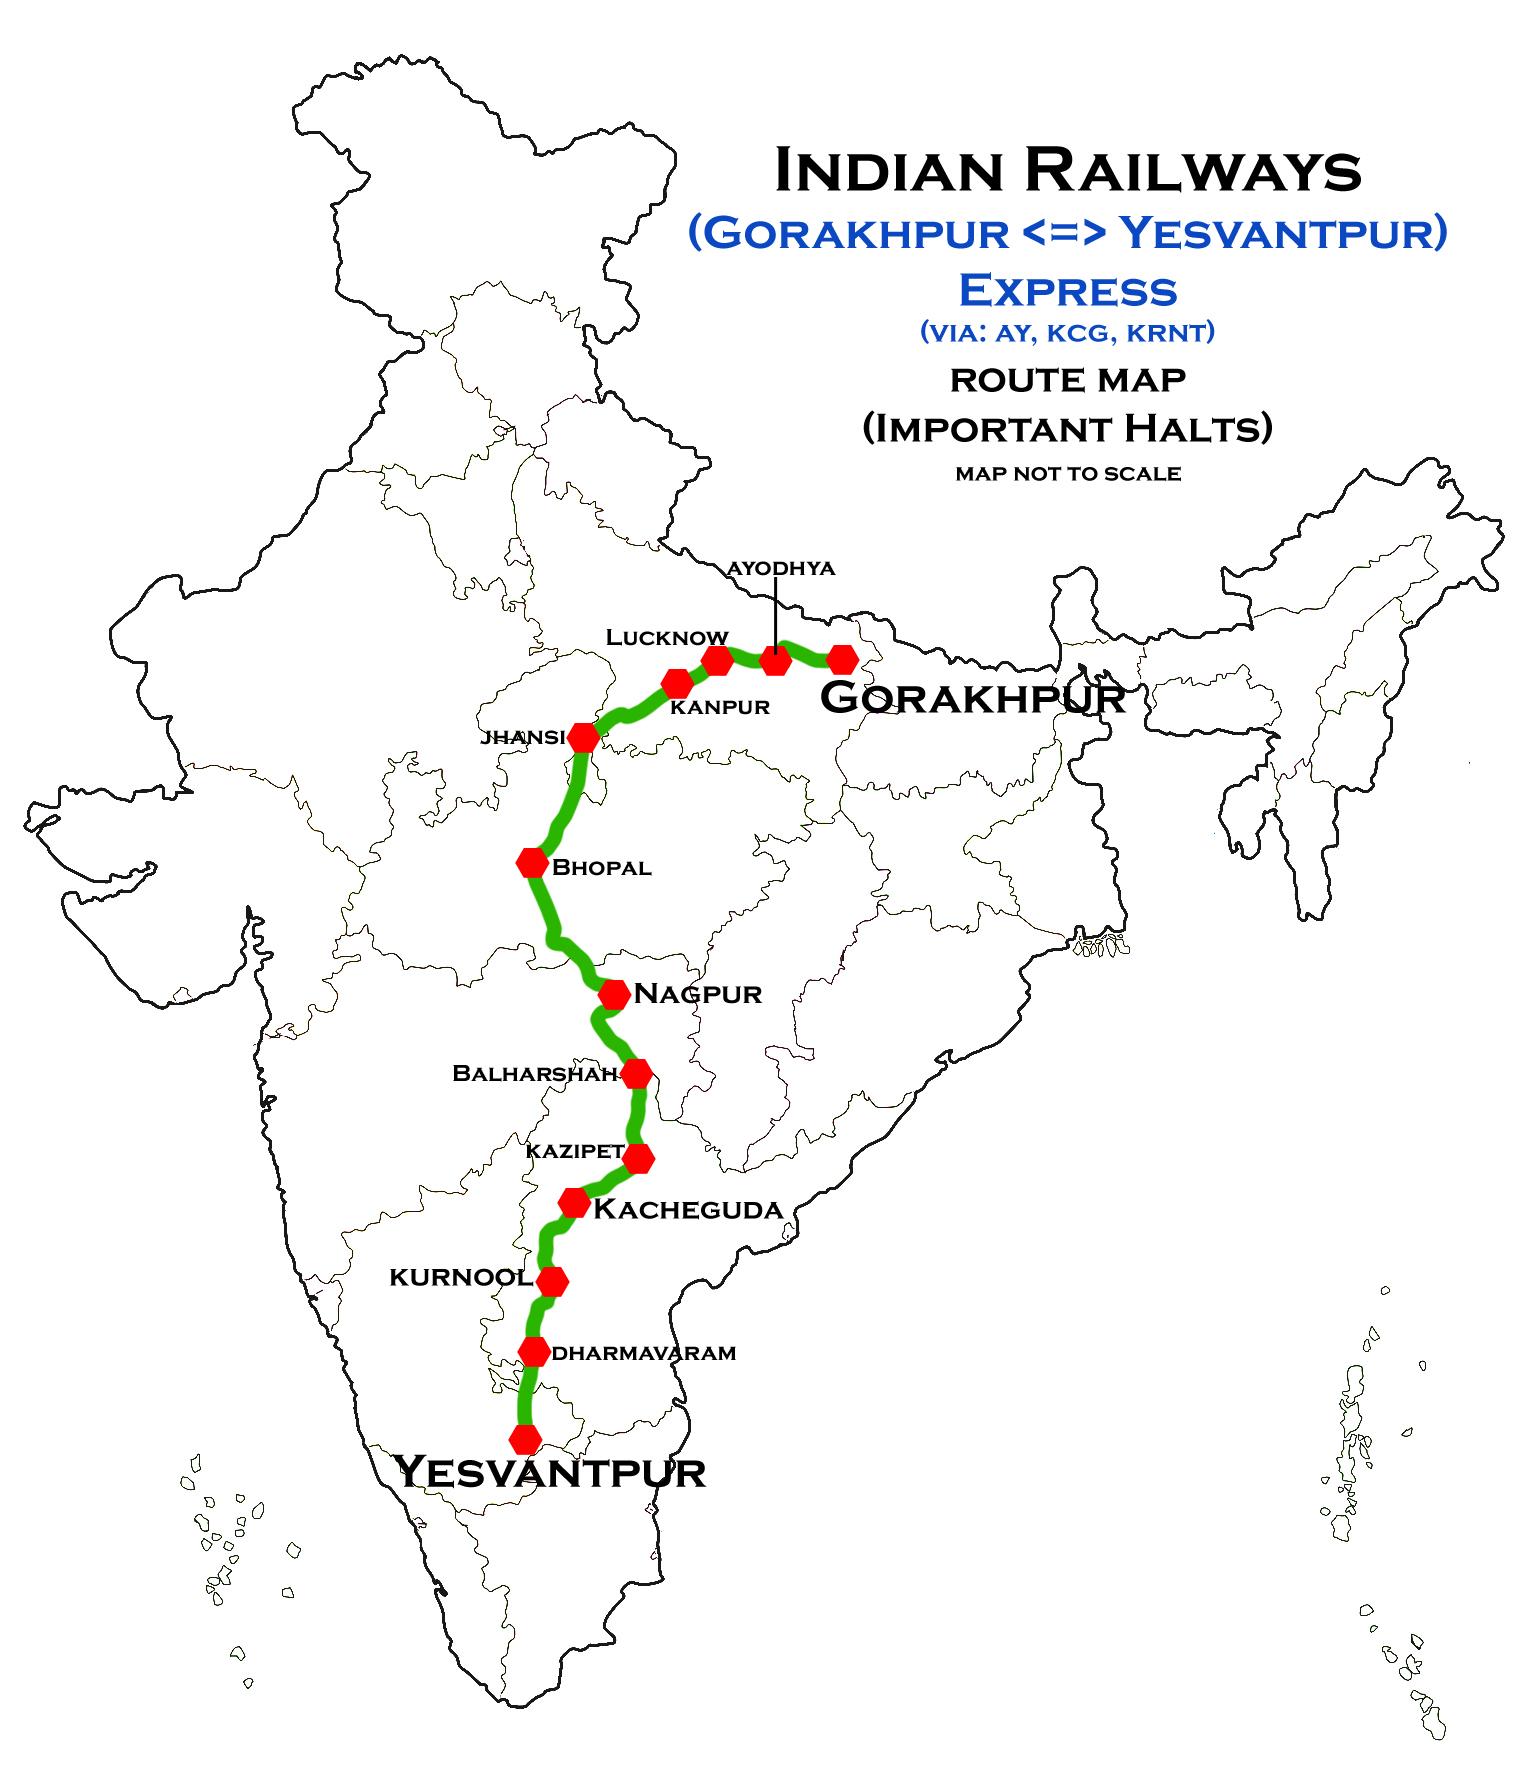 Ayodhya In India Map.File Gorakhpur Yesvantpur Via Ayodhya Express Route Map Jpg